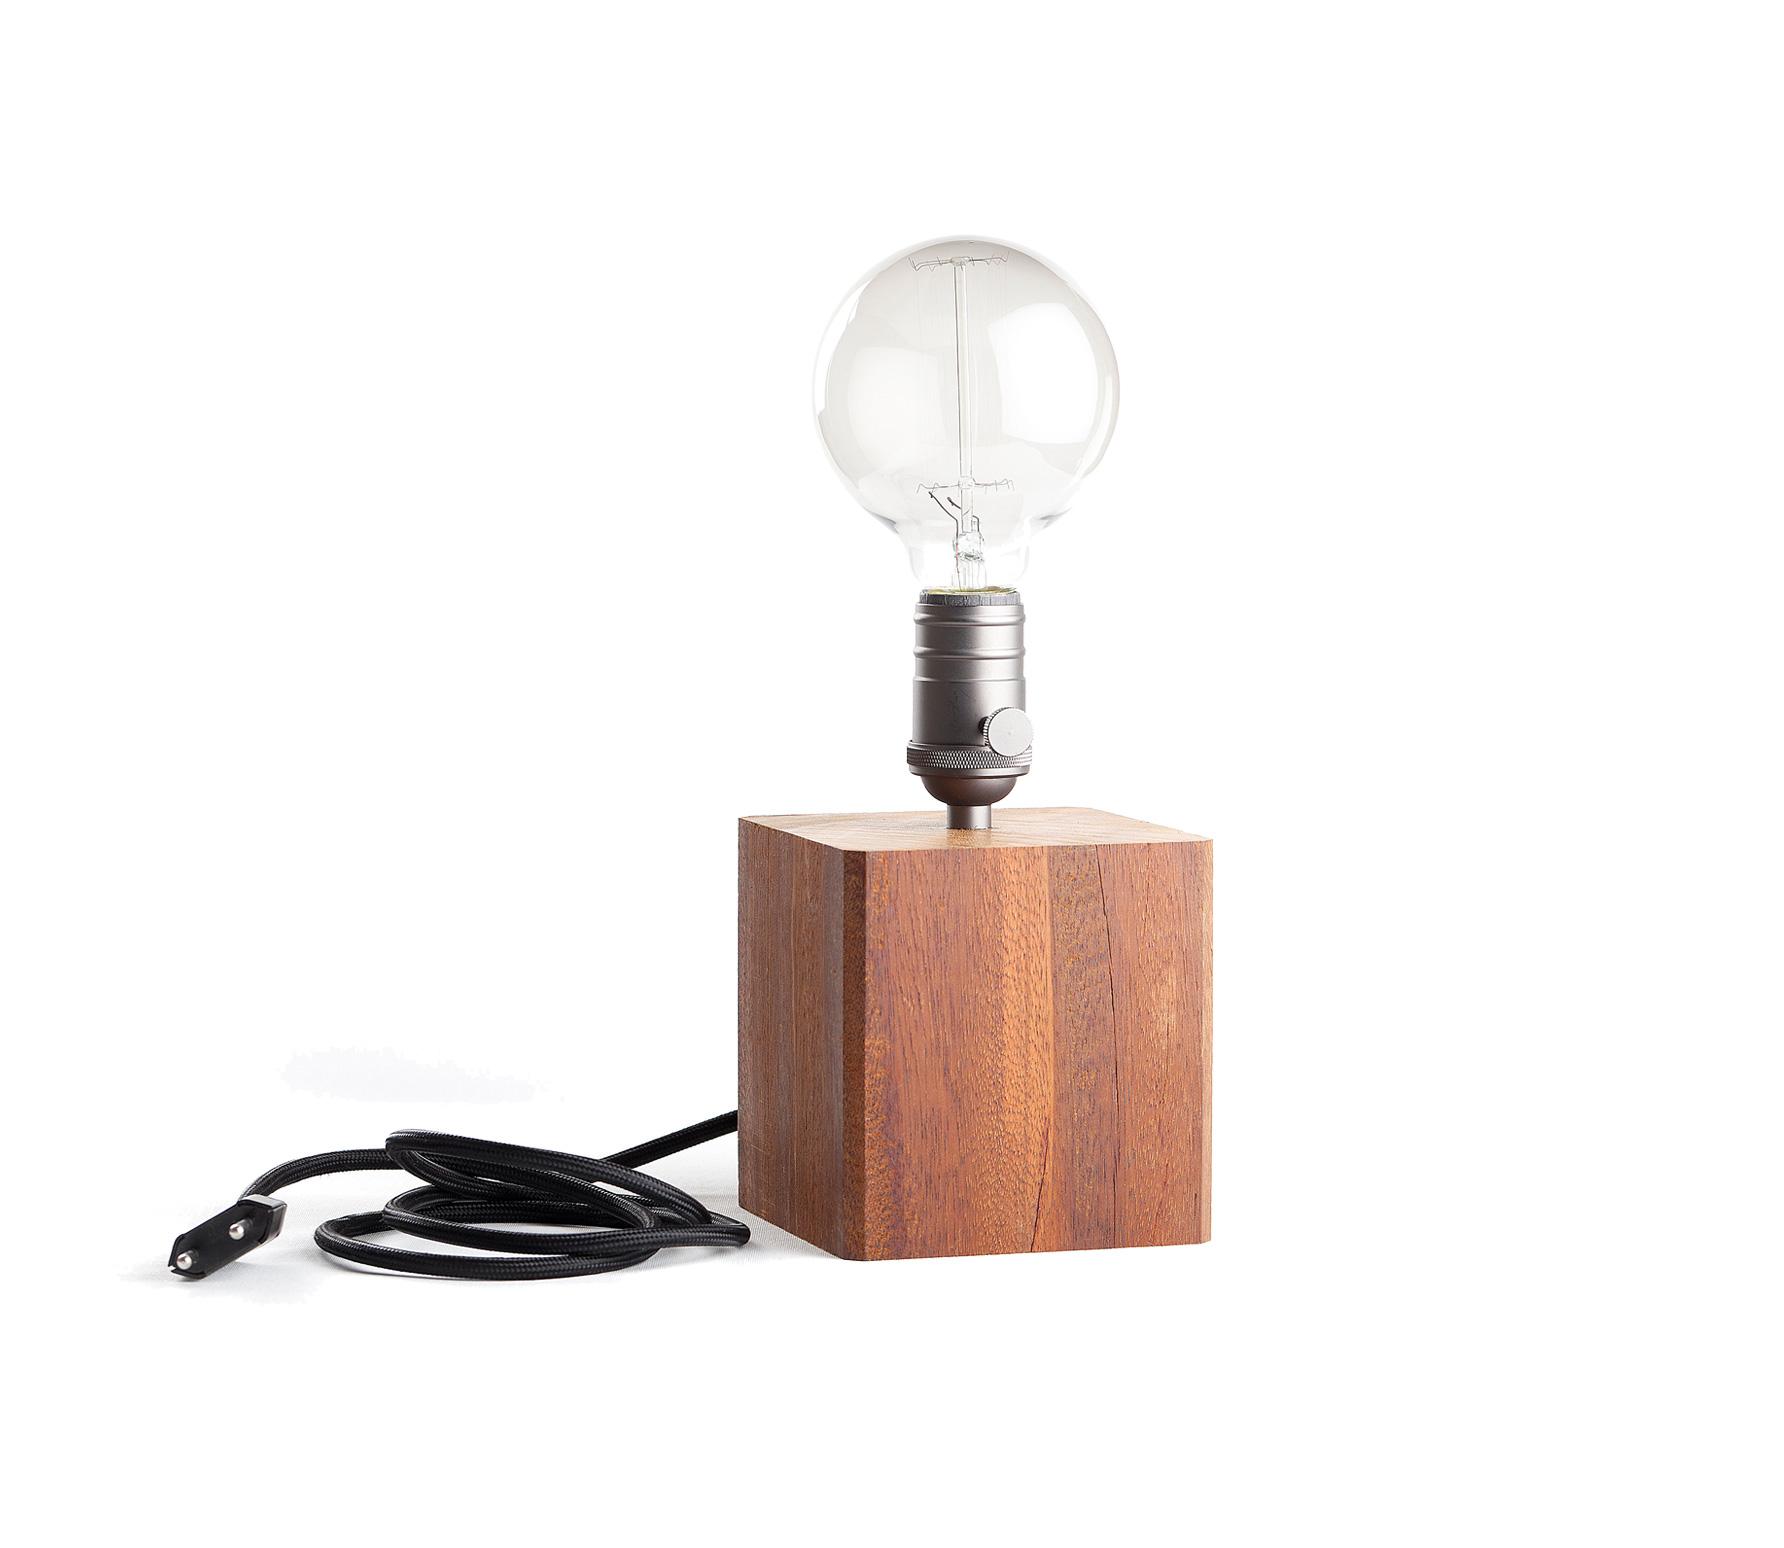 Basiclabel Industriële tafellamp hout incl lamp vrijstaand